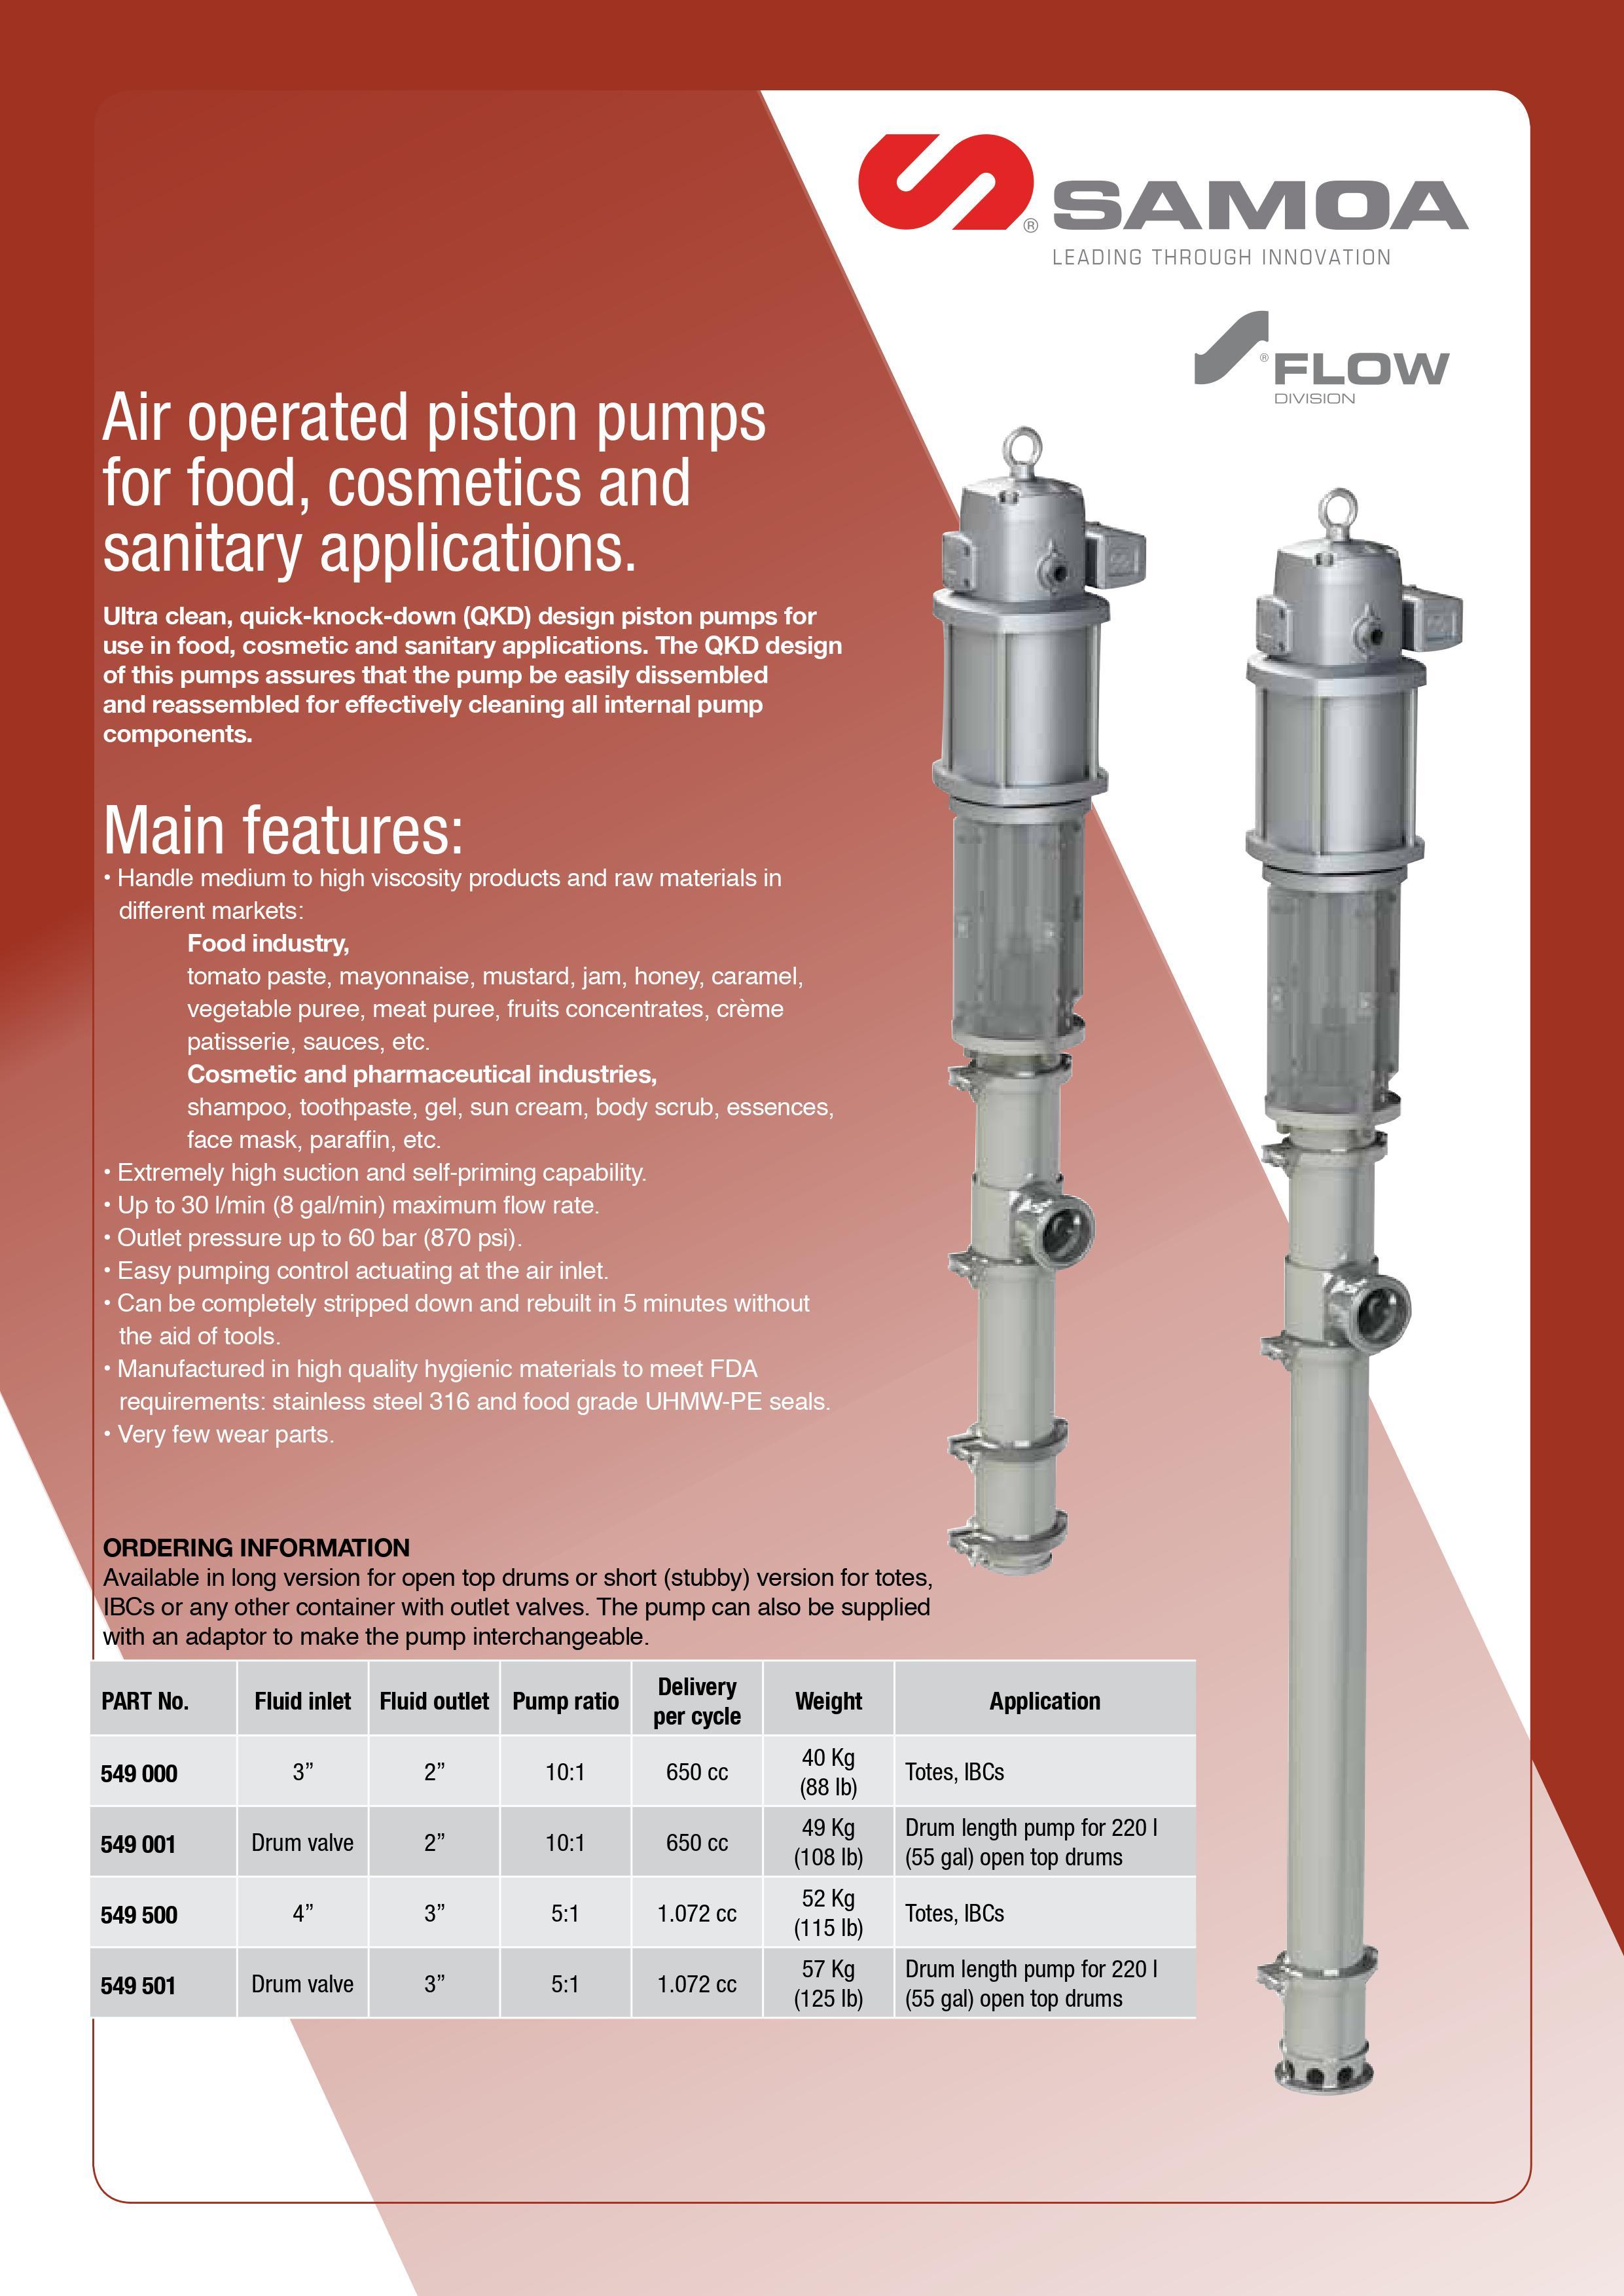 SAMOA Pumpmaster FDA QKD Piston Pump Brochure